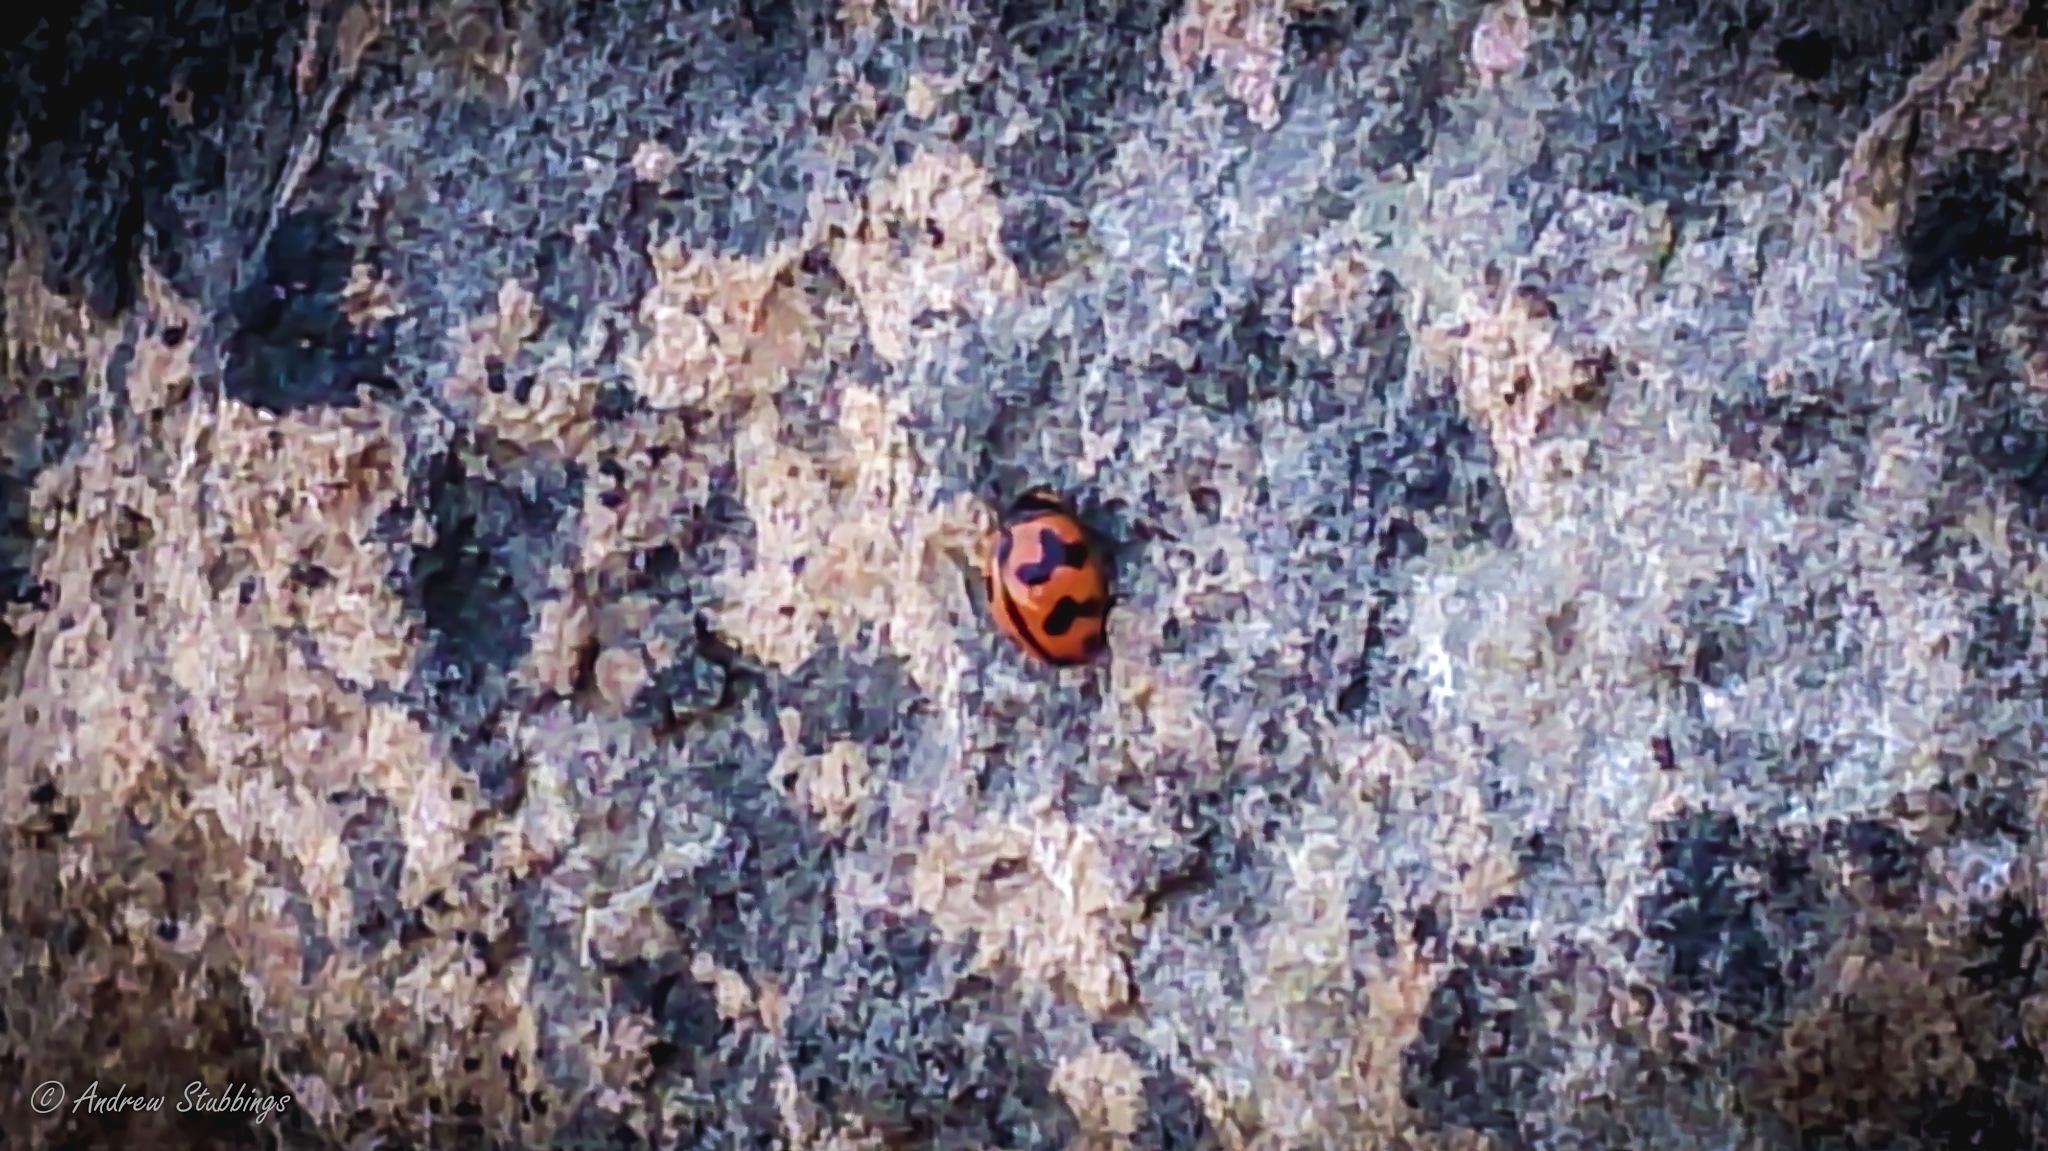 Ladybug by Andrew Stubbings